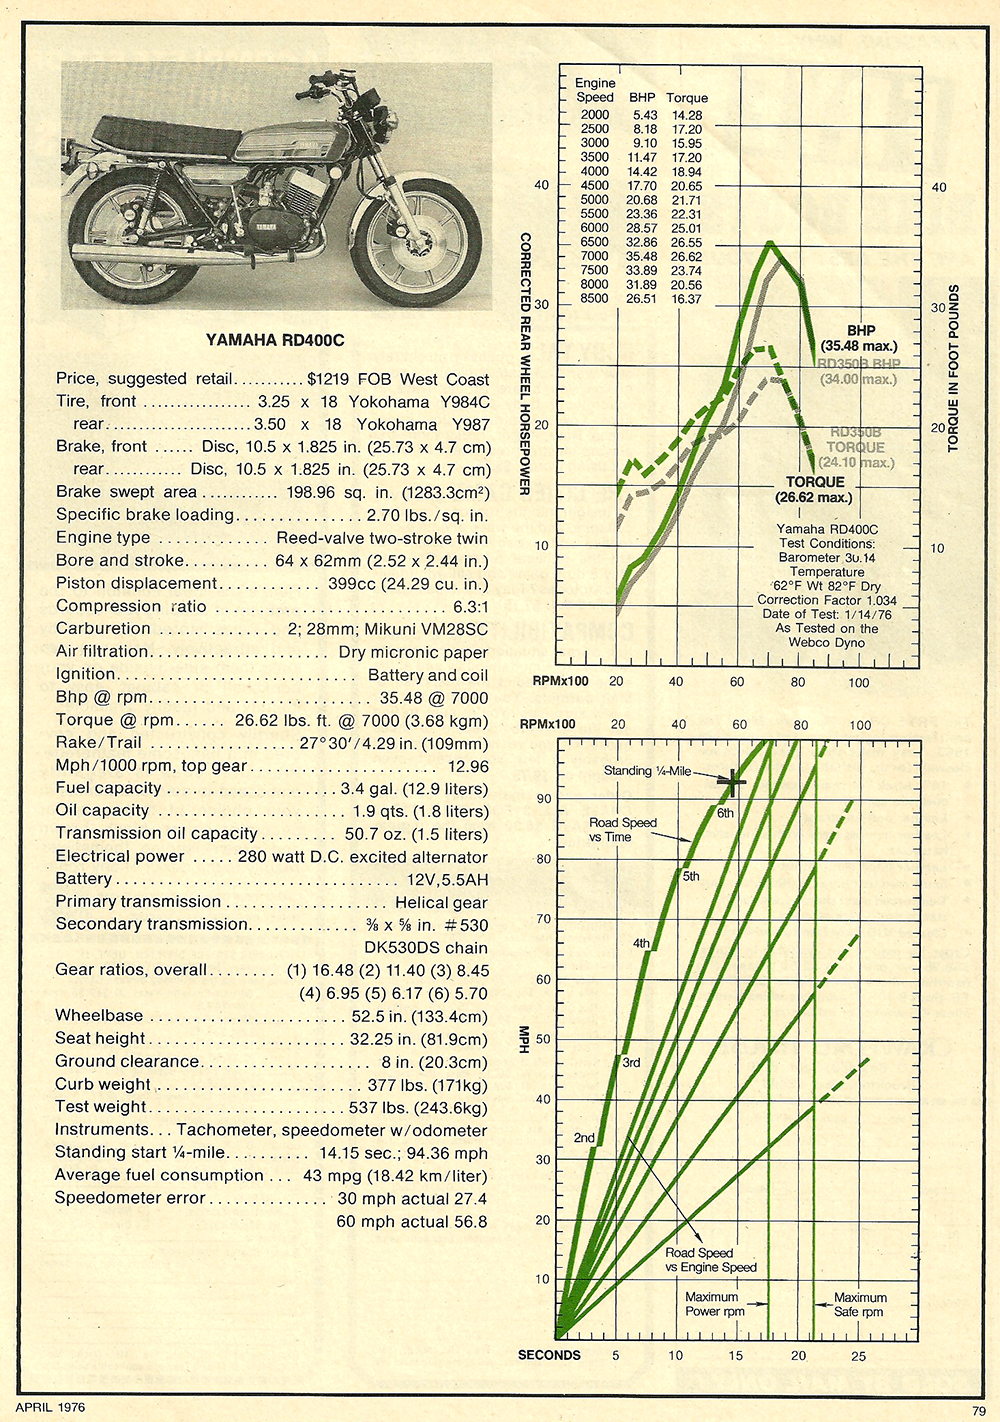 1976 Yamaha RD400C road test 6.jpg